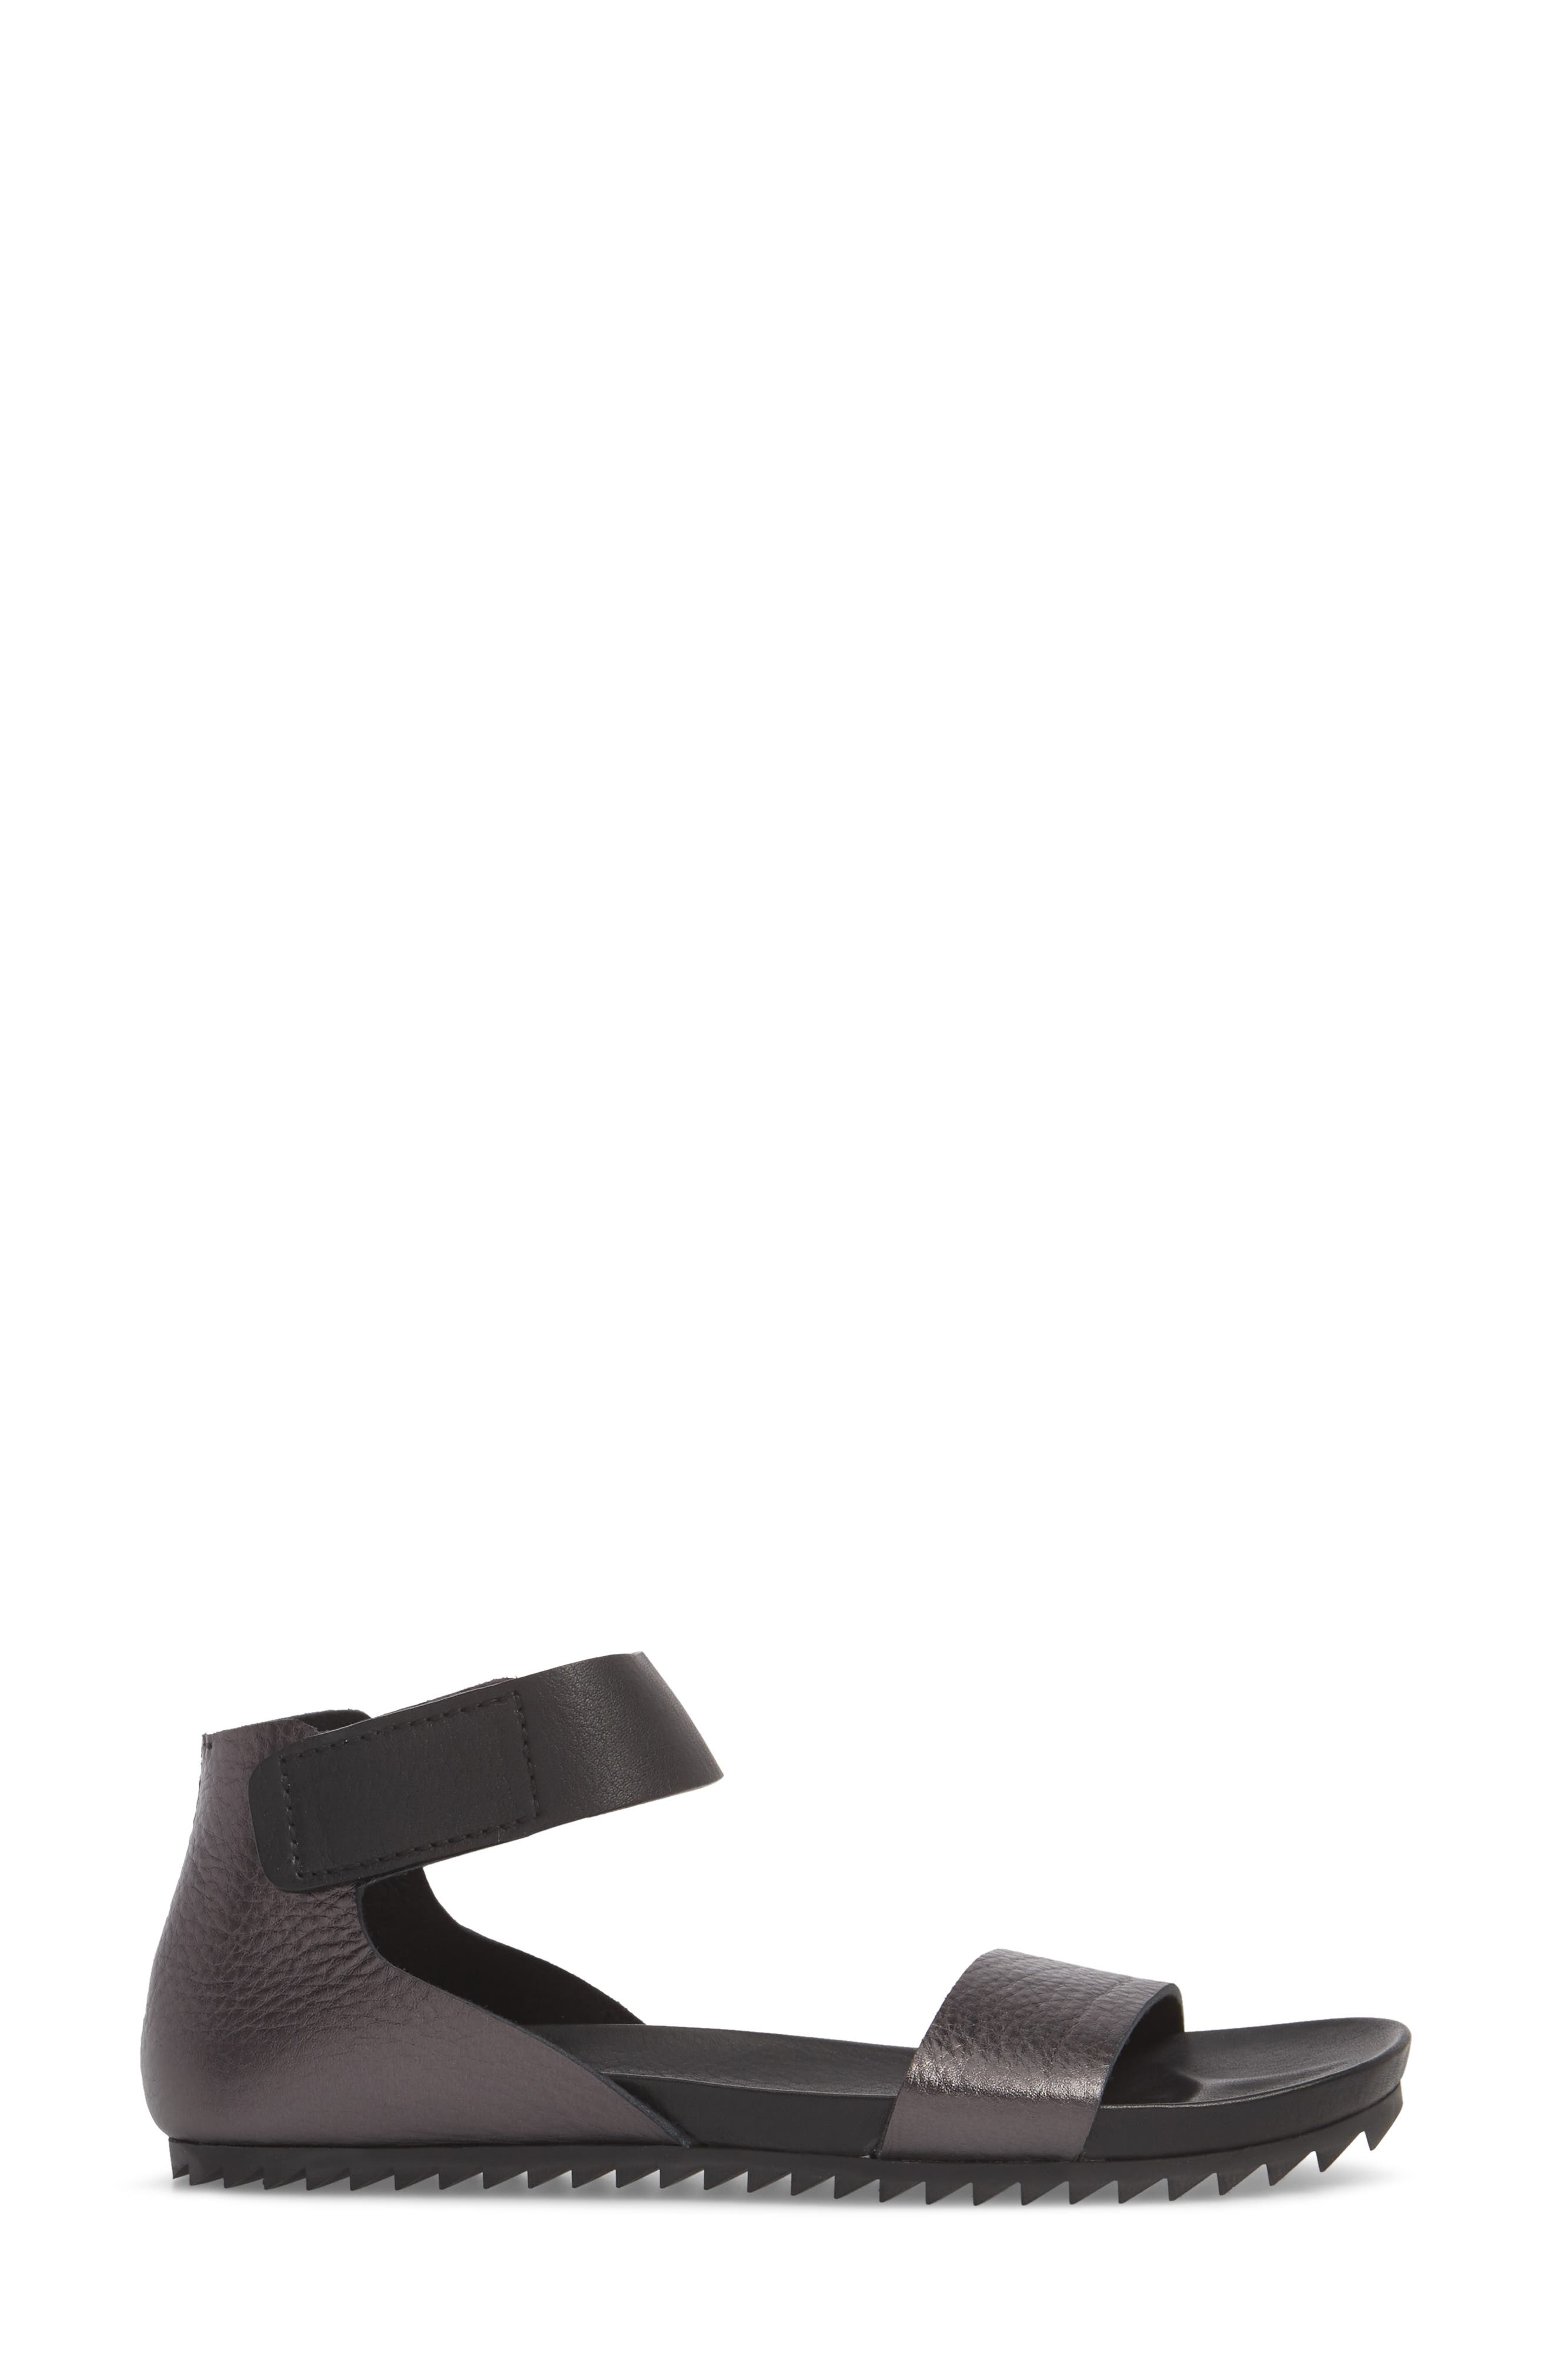 Jalila Ankle Strap Sandal,                             Alternate thumbnail 3, color,                             Fox Cervo Lame